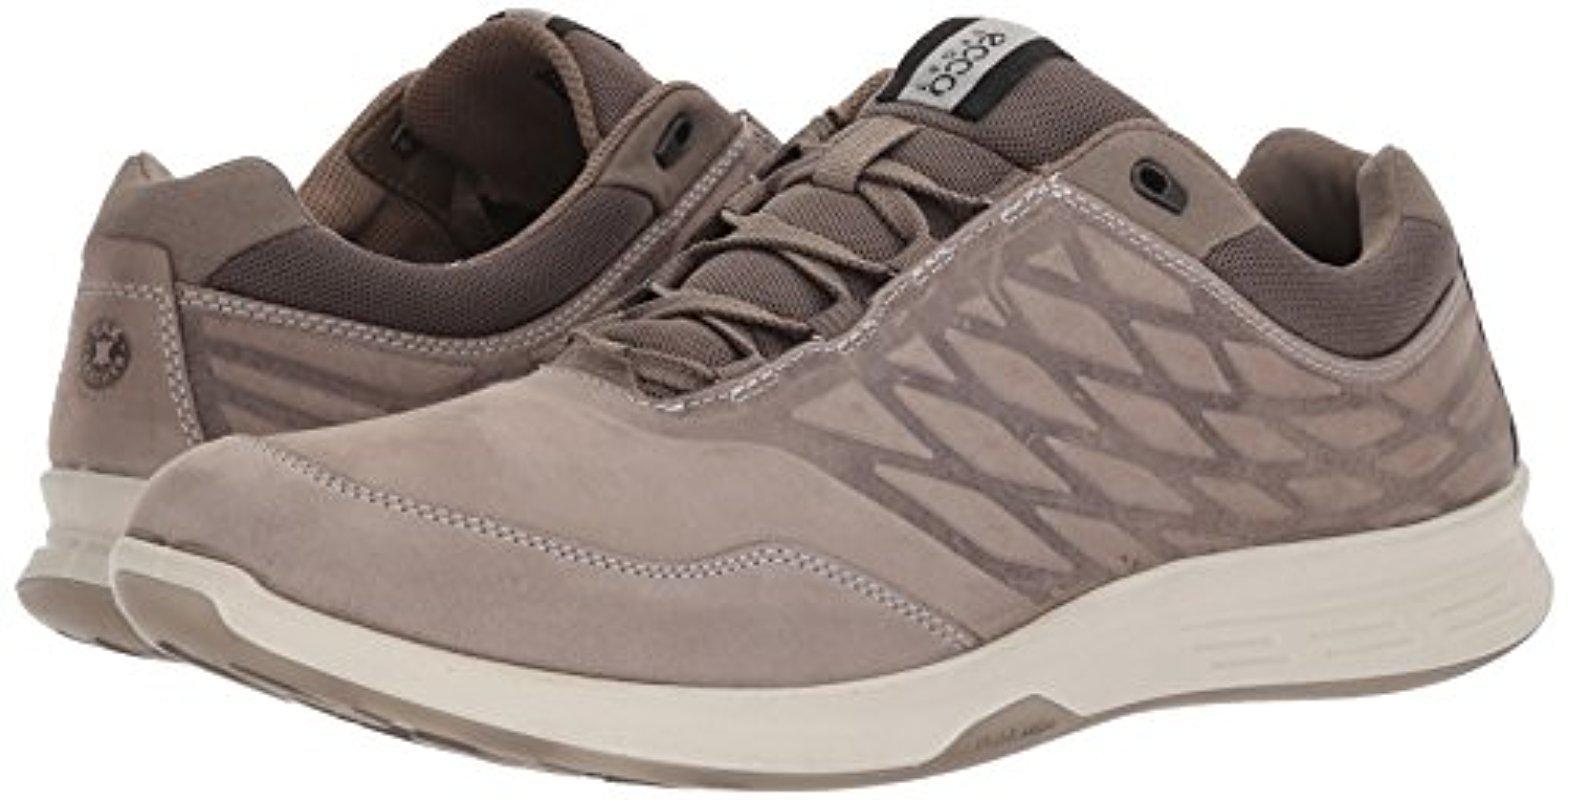 newest 63ade 309f0 Men's Gray Exceed Low Walking Shoe Fashion Sneaker